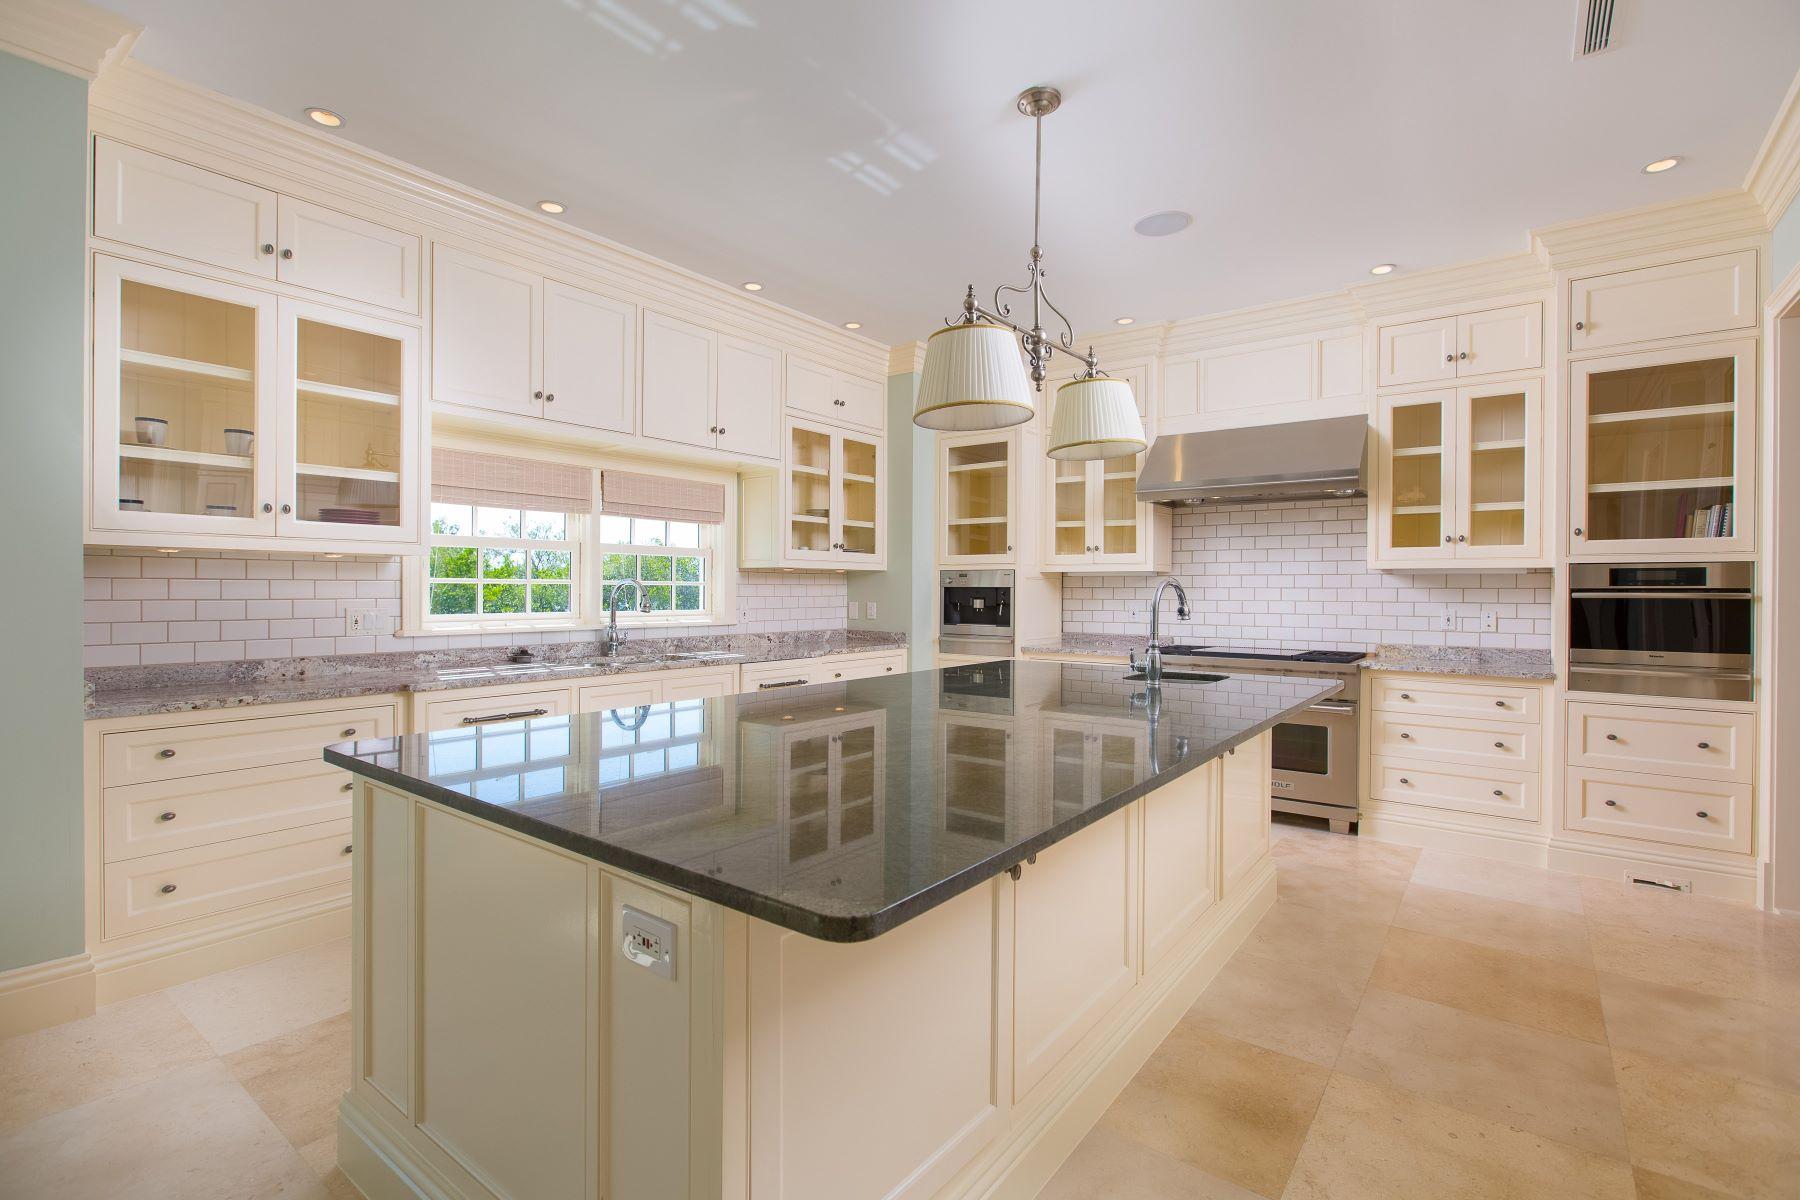 Additional photo for property listing at 9235 W. Marsh Island Drive Vero Beach, F?????ta 32963 ???µ??e? ????te?e?